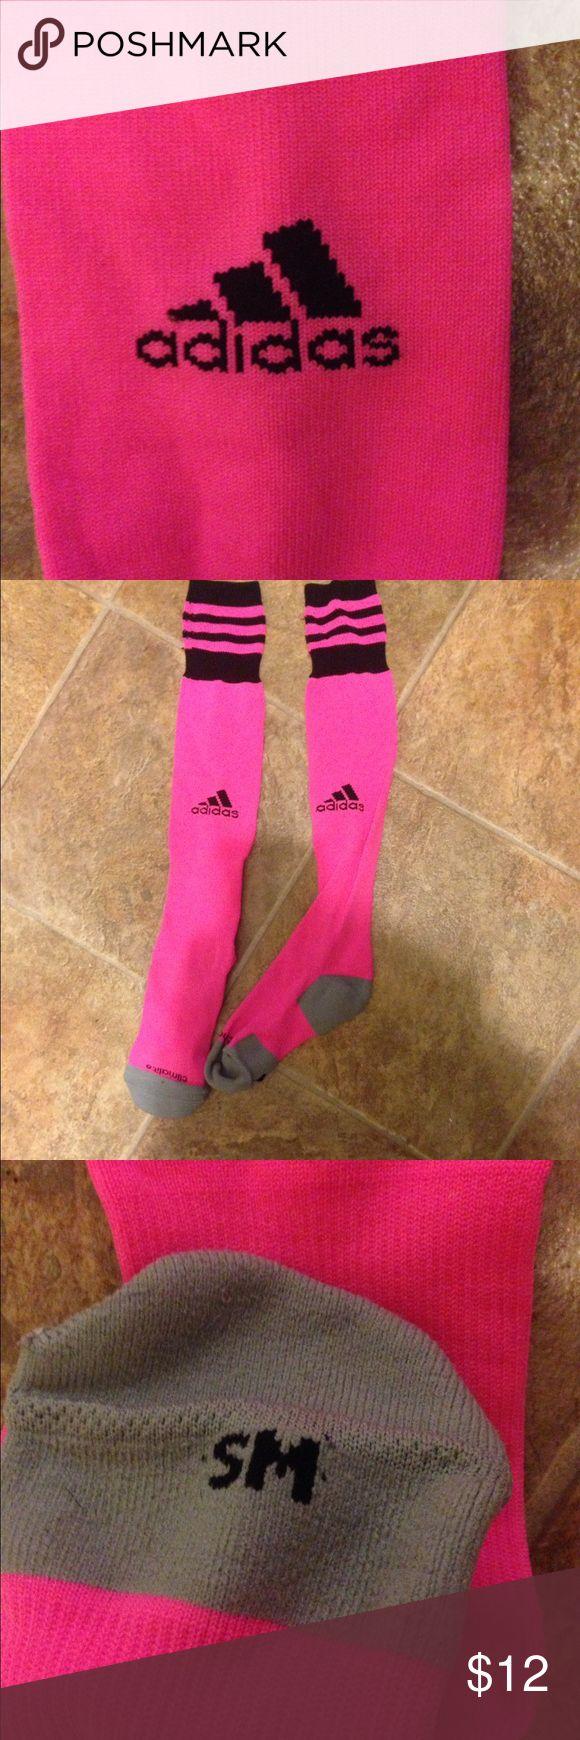 Pink adidas soccer socks NWOT- never worn pink adidas soccer socks size s/m Adidas Other